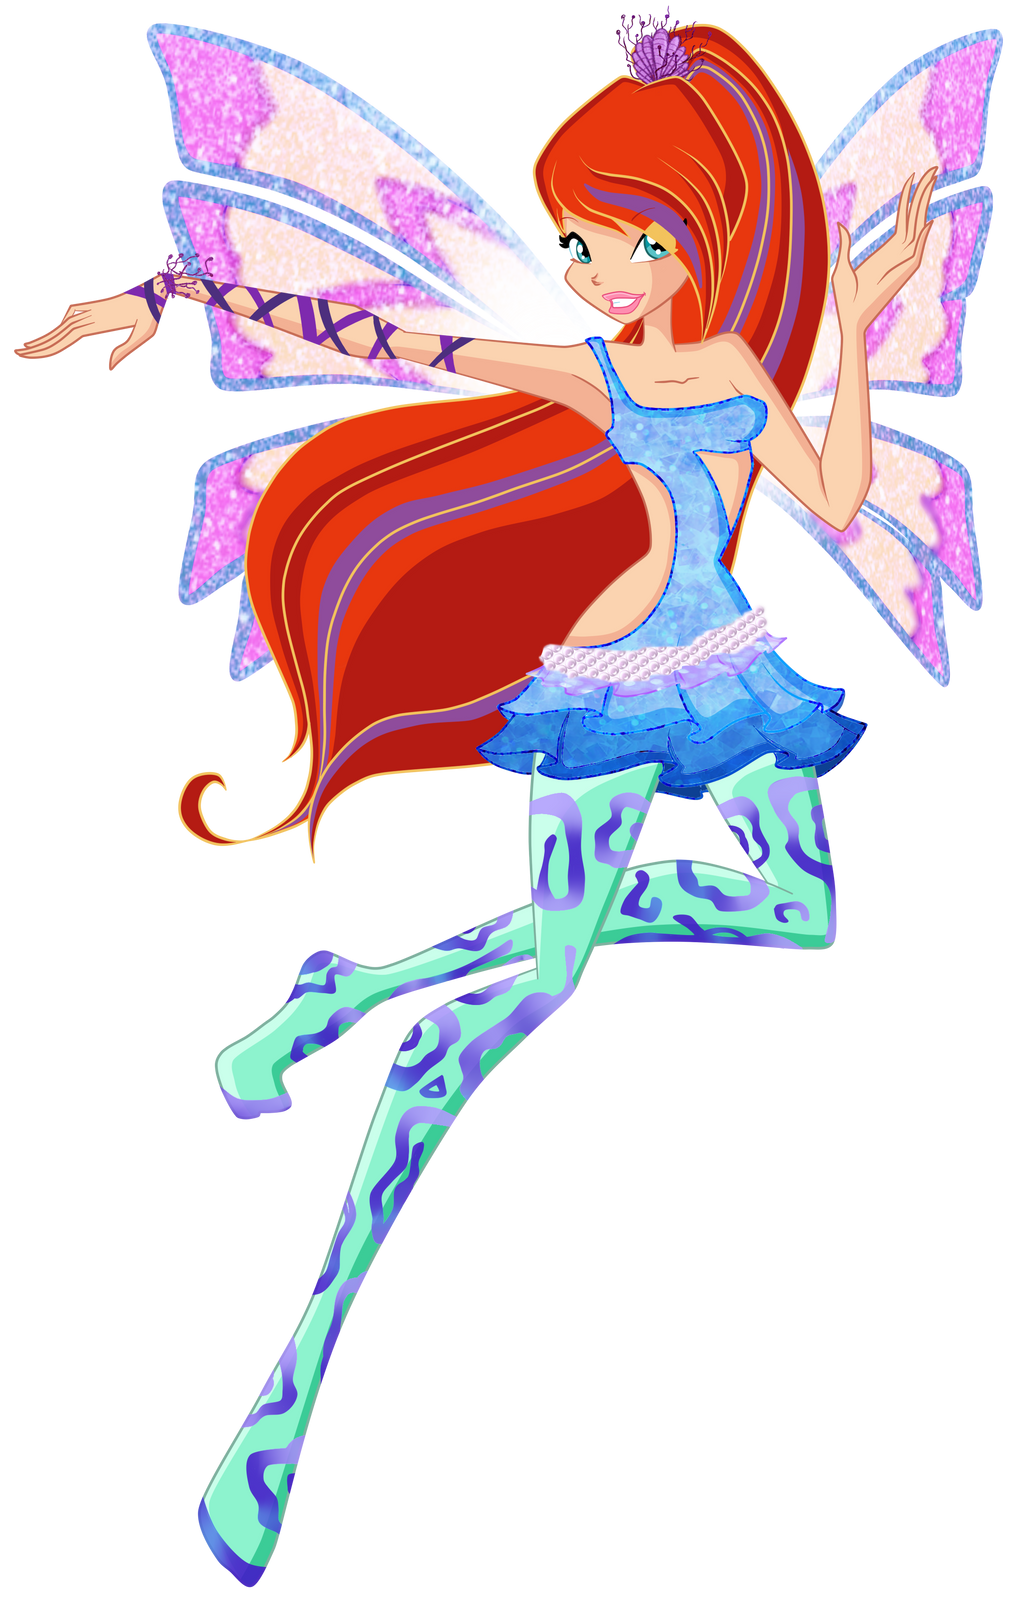 Dragon 3d and fairies on pinterest - Winx club sirenix ...